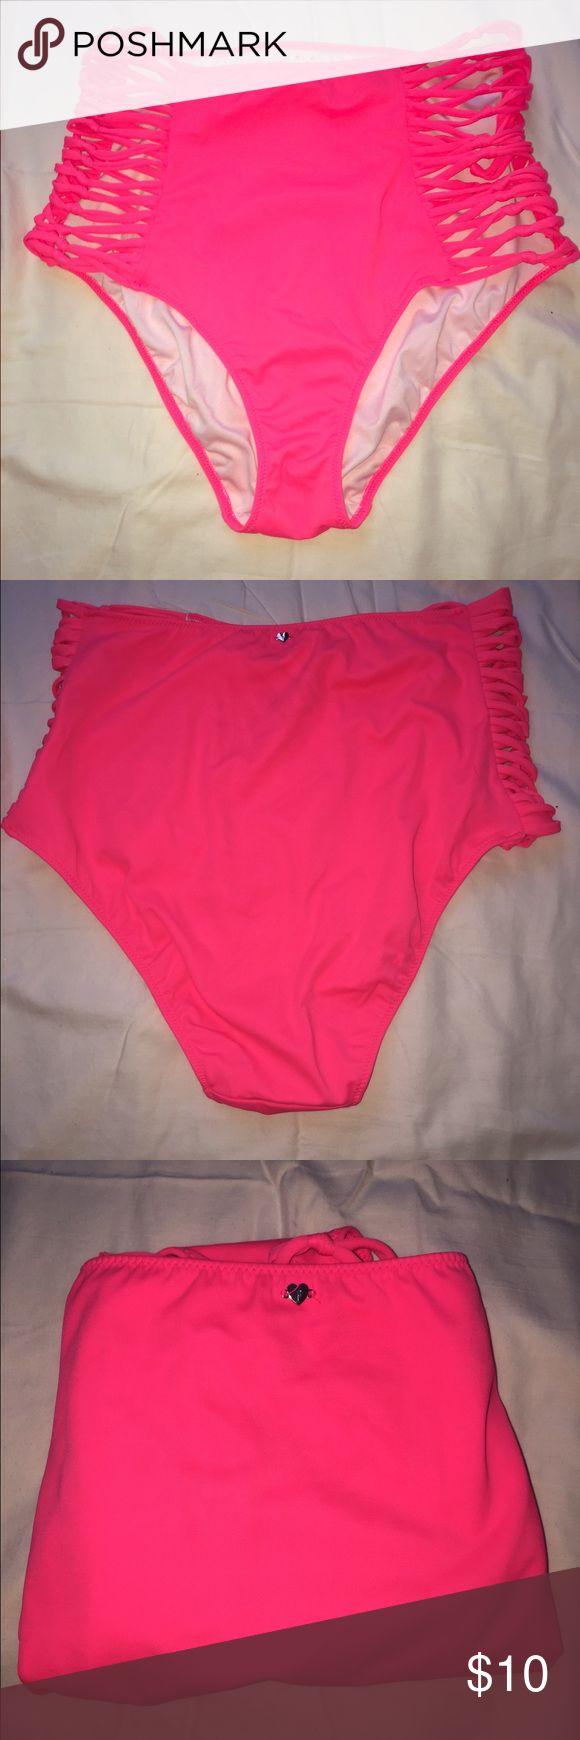 High Waisted Hot Pink Bikini Bottoms Pink Victoria Secret High Waisted Hot Pink Bikini Bottoms. Strappy detailing. 80% Polyester. 20% Elastic. Worn Once. Victoria's Secret Swim Bikinis